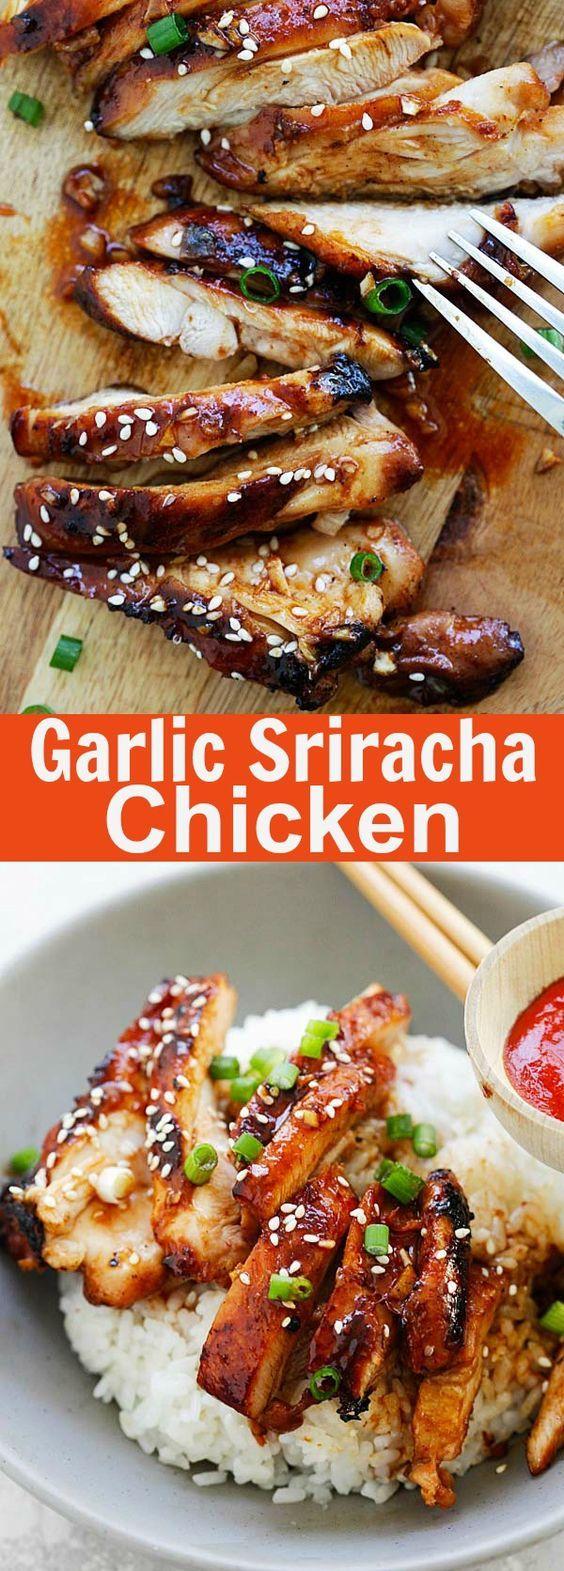 Garlic Sriracha Chicken - the juiciest oven baked chicken recipe with a mouthwatering Garlic Sriracha marinade, so delicious | rasamalaysia.com